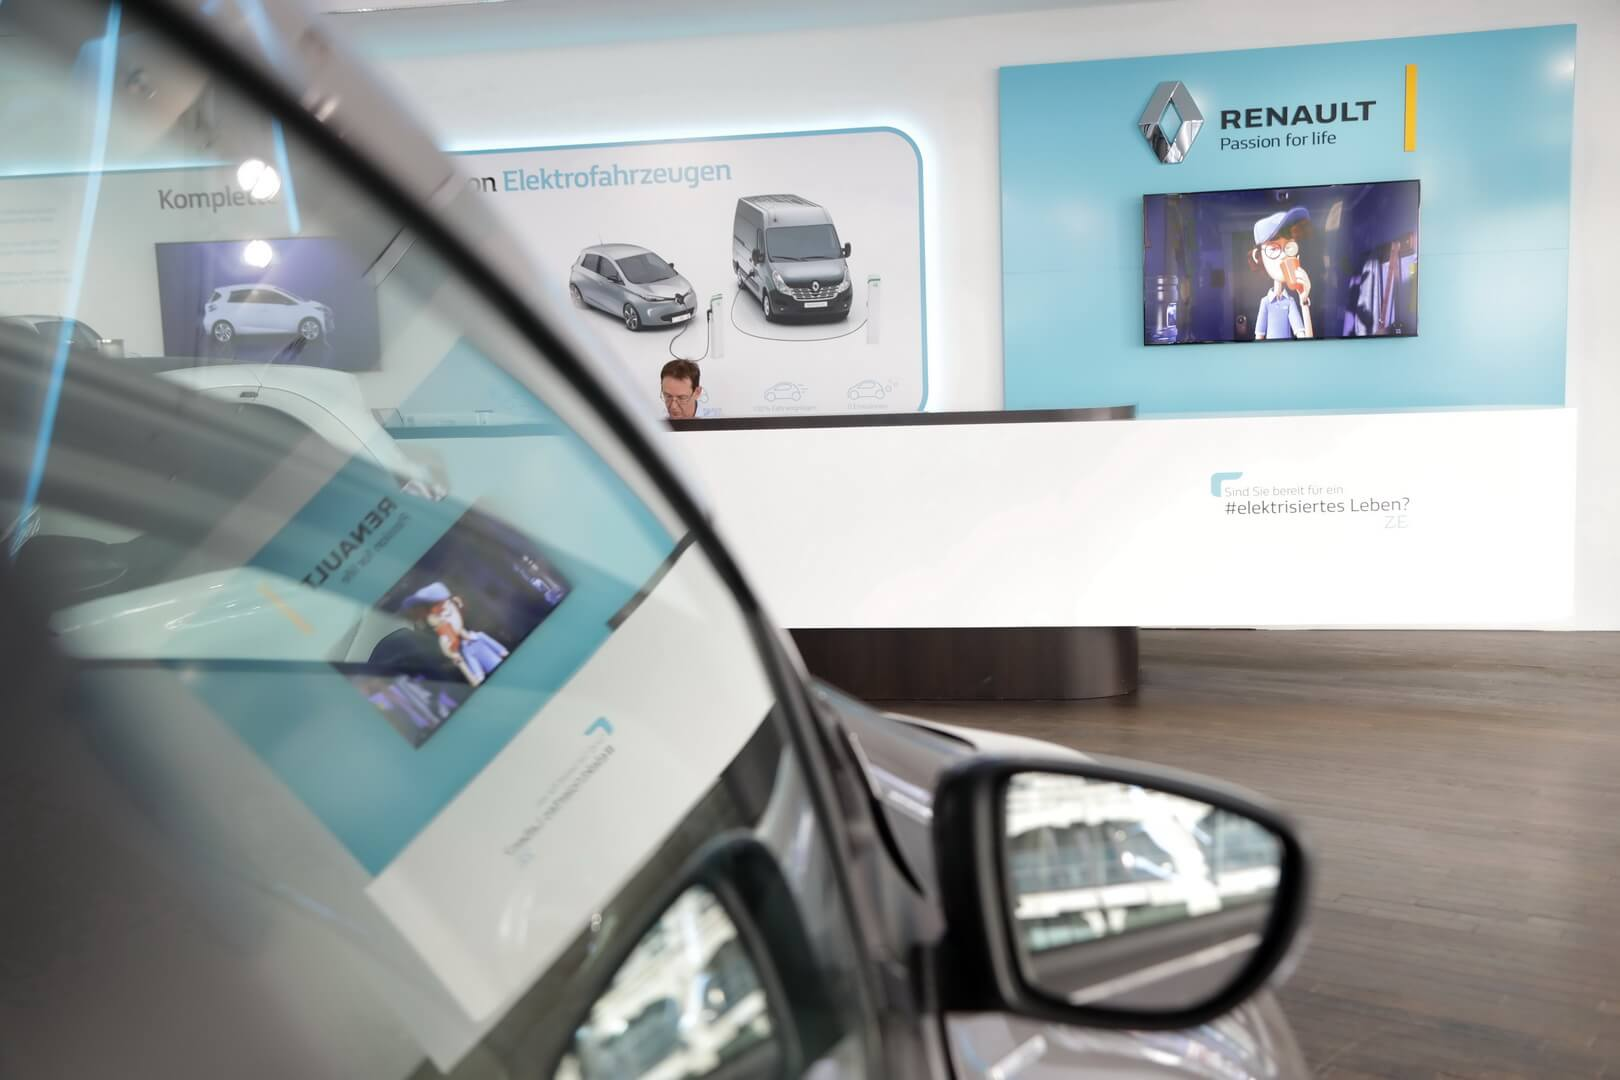 Центр электромобилей Renault в Берлине